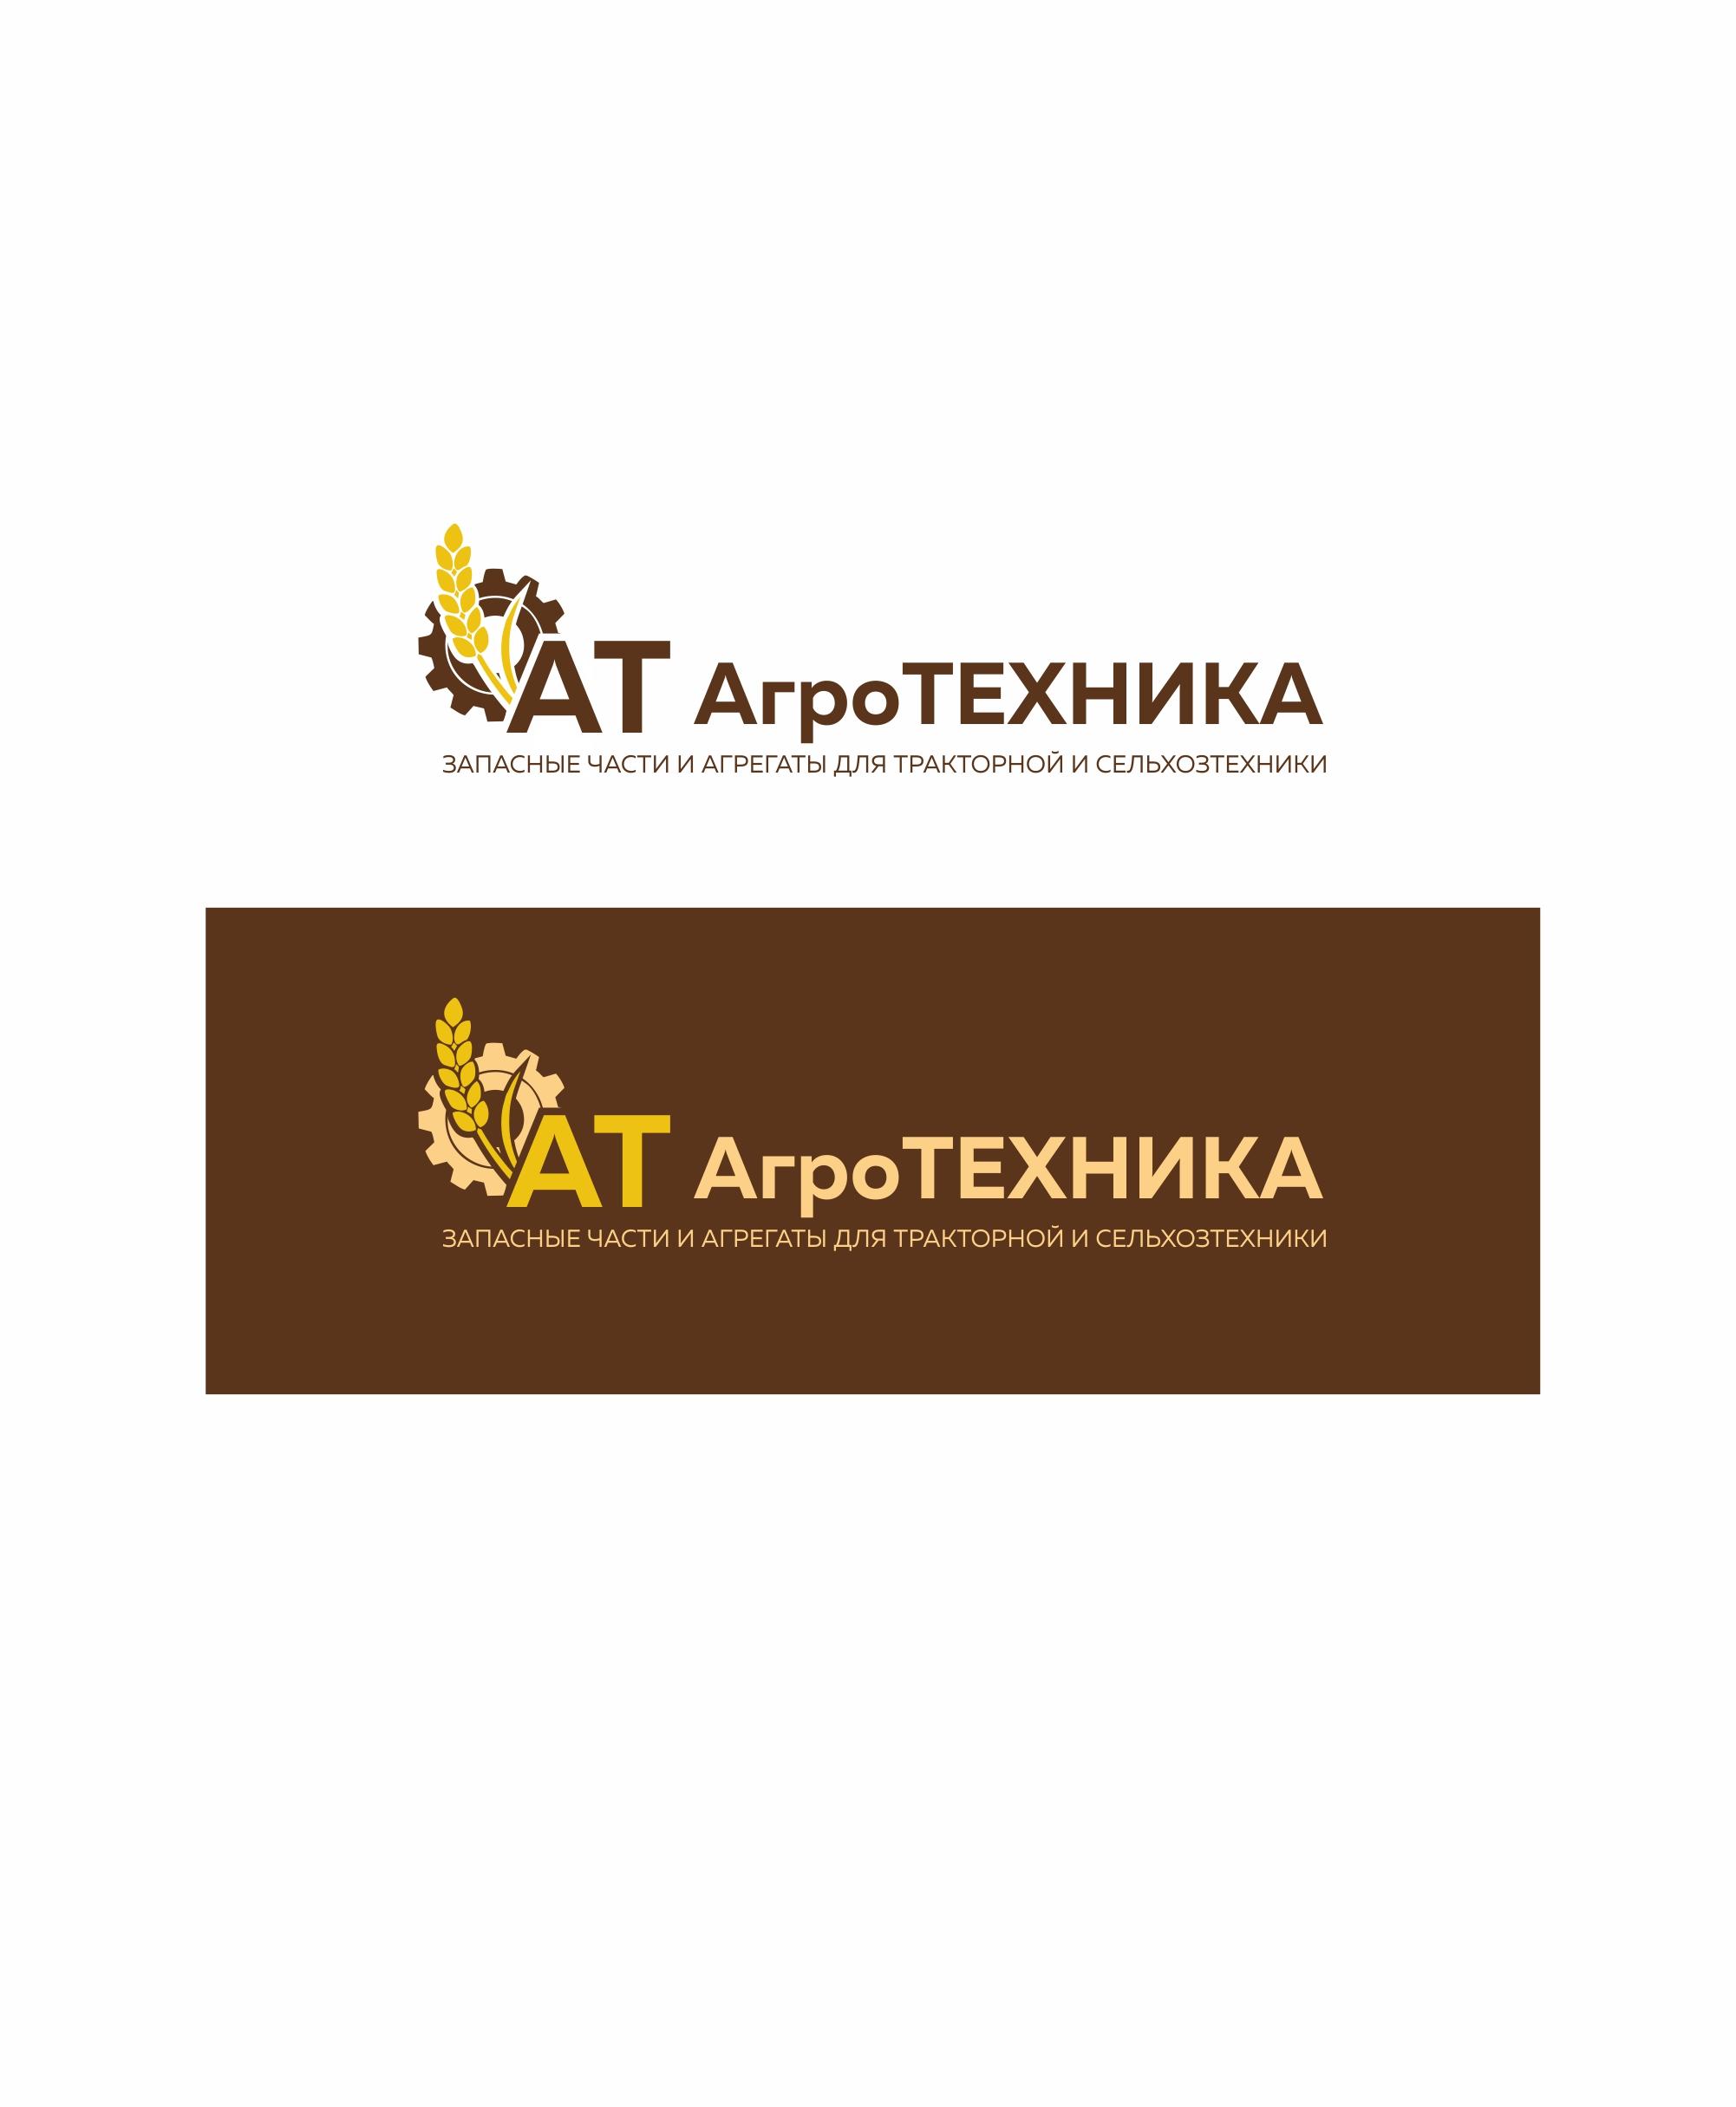 Разработка логотипа для компании Агротехника фото f_9985c04c100b8f07.jpg